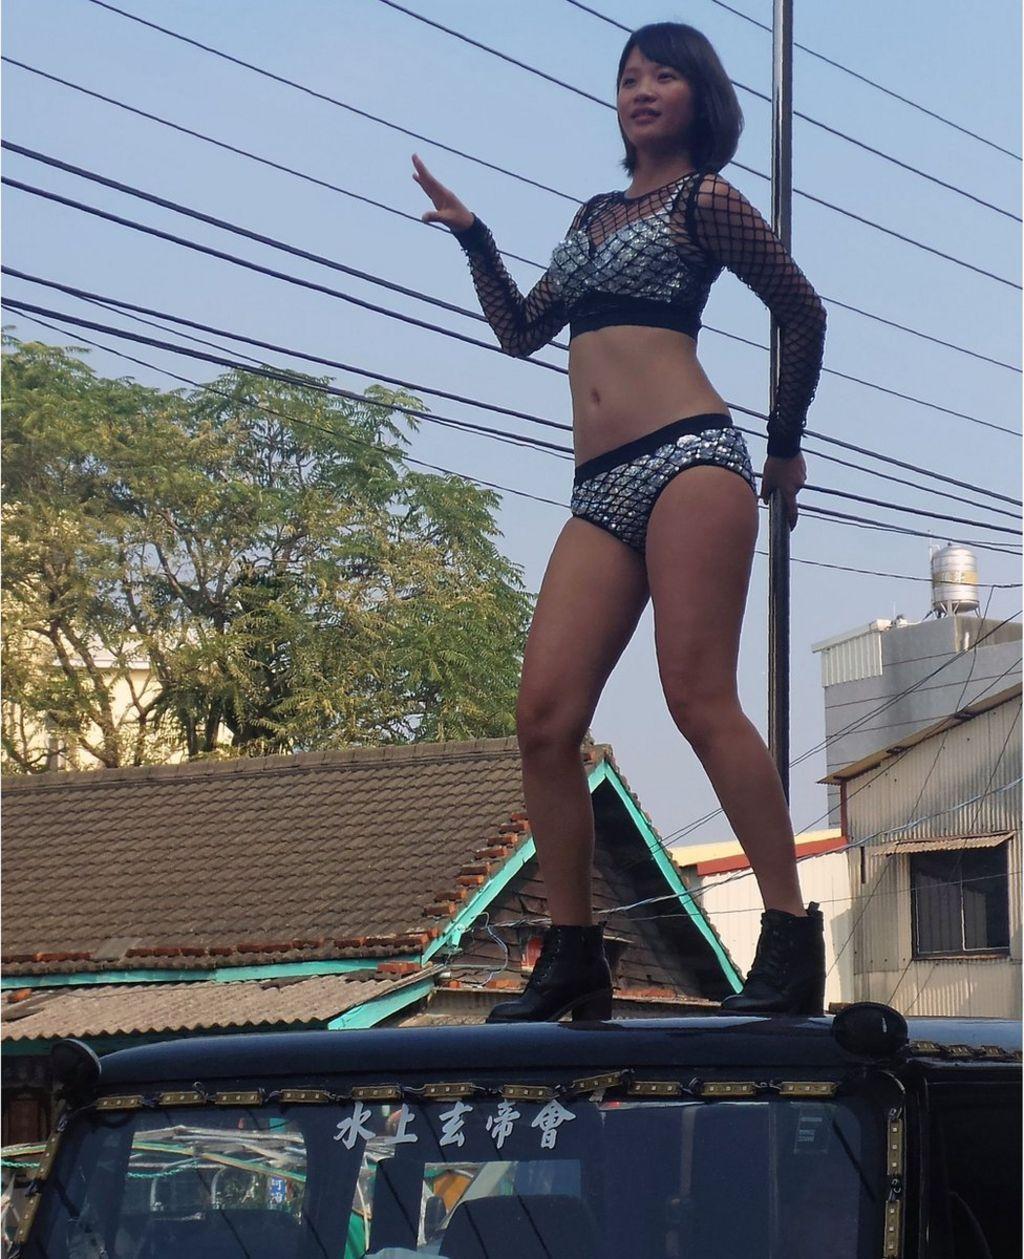 Stripper practice vidoe authoritative point